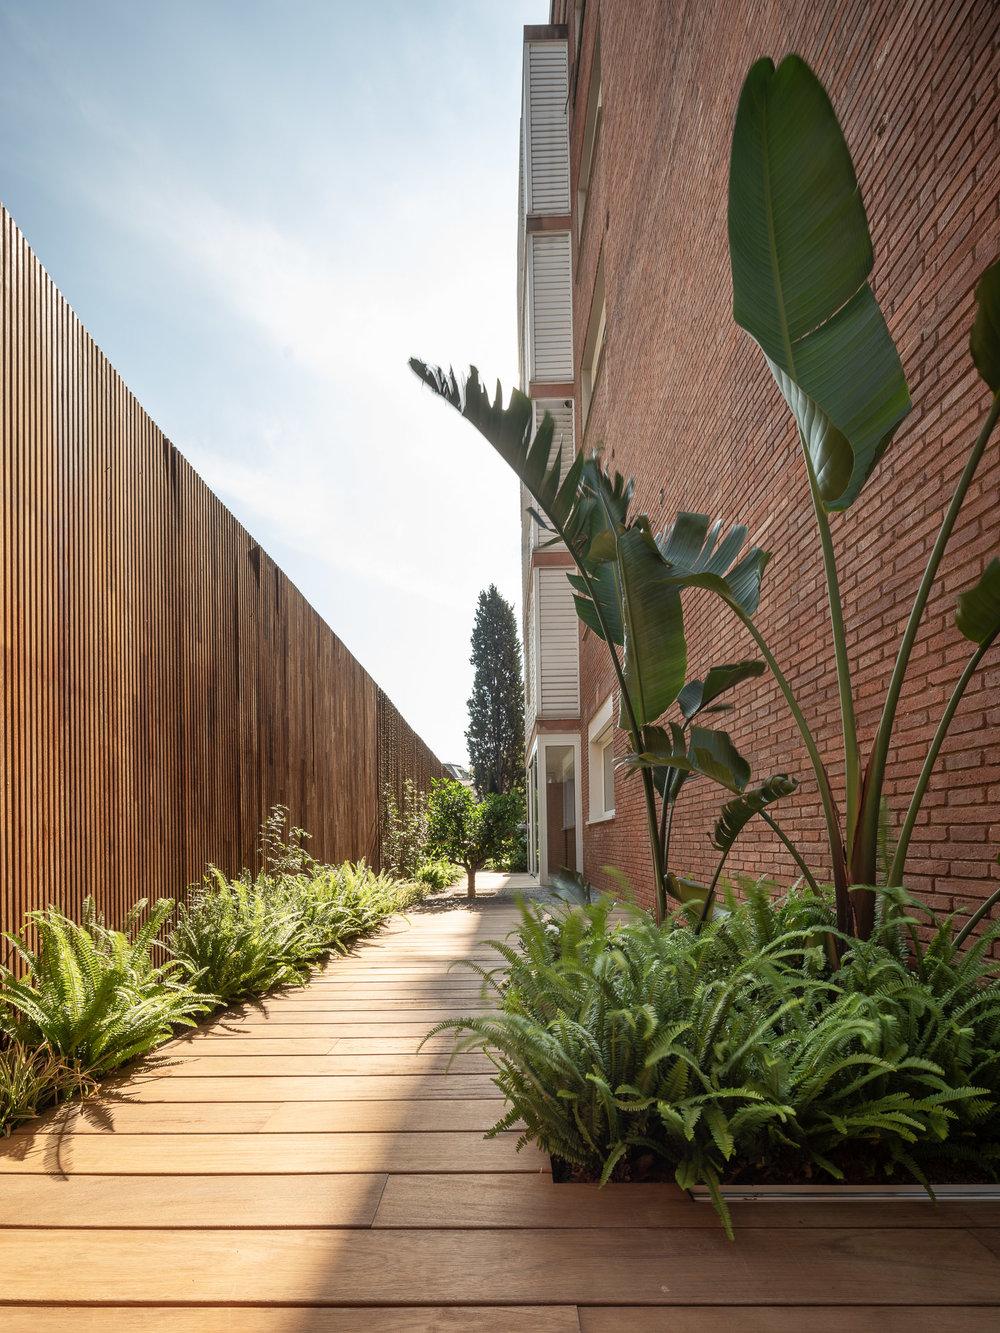 aeland-garden-barcelona3.jpg